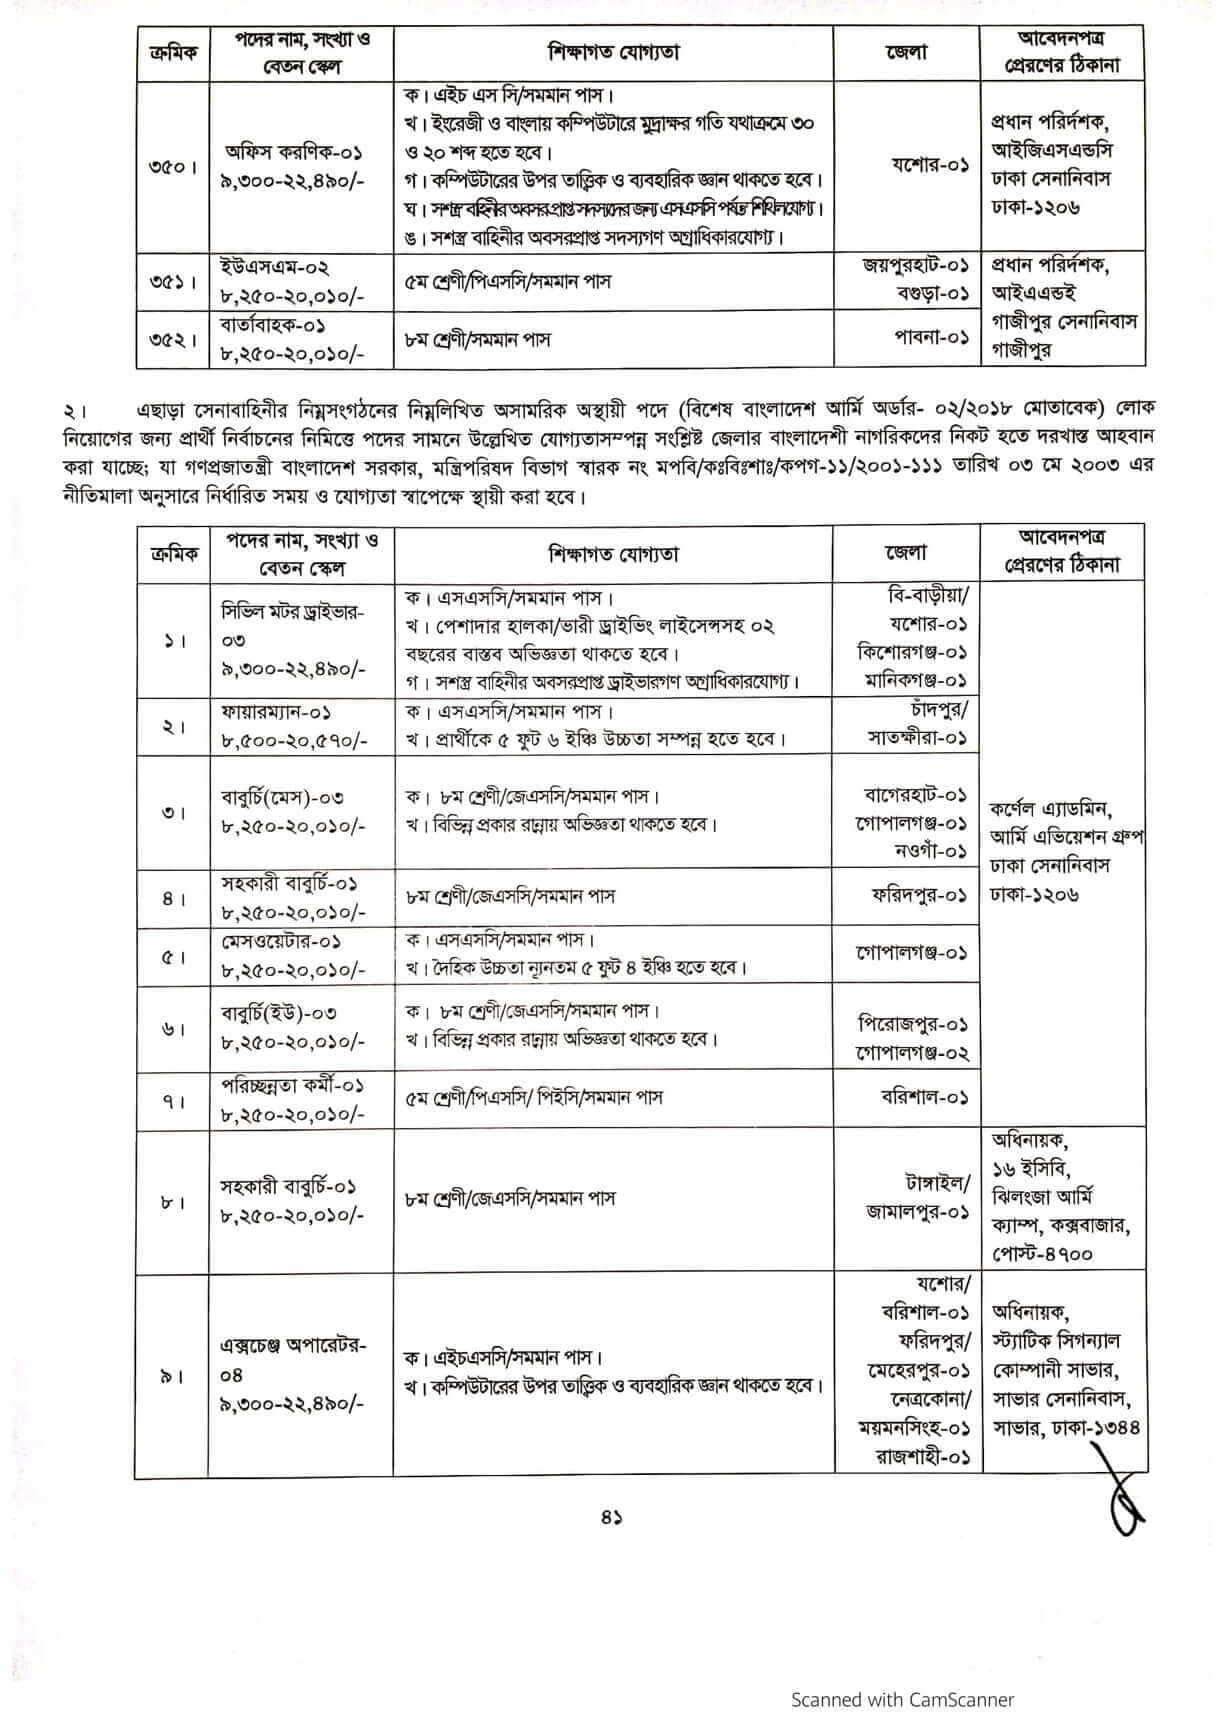 army job circular 2021 PDF